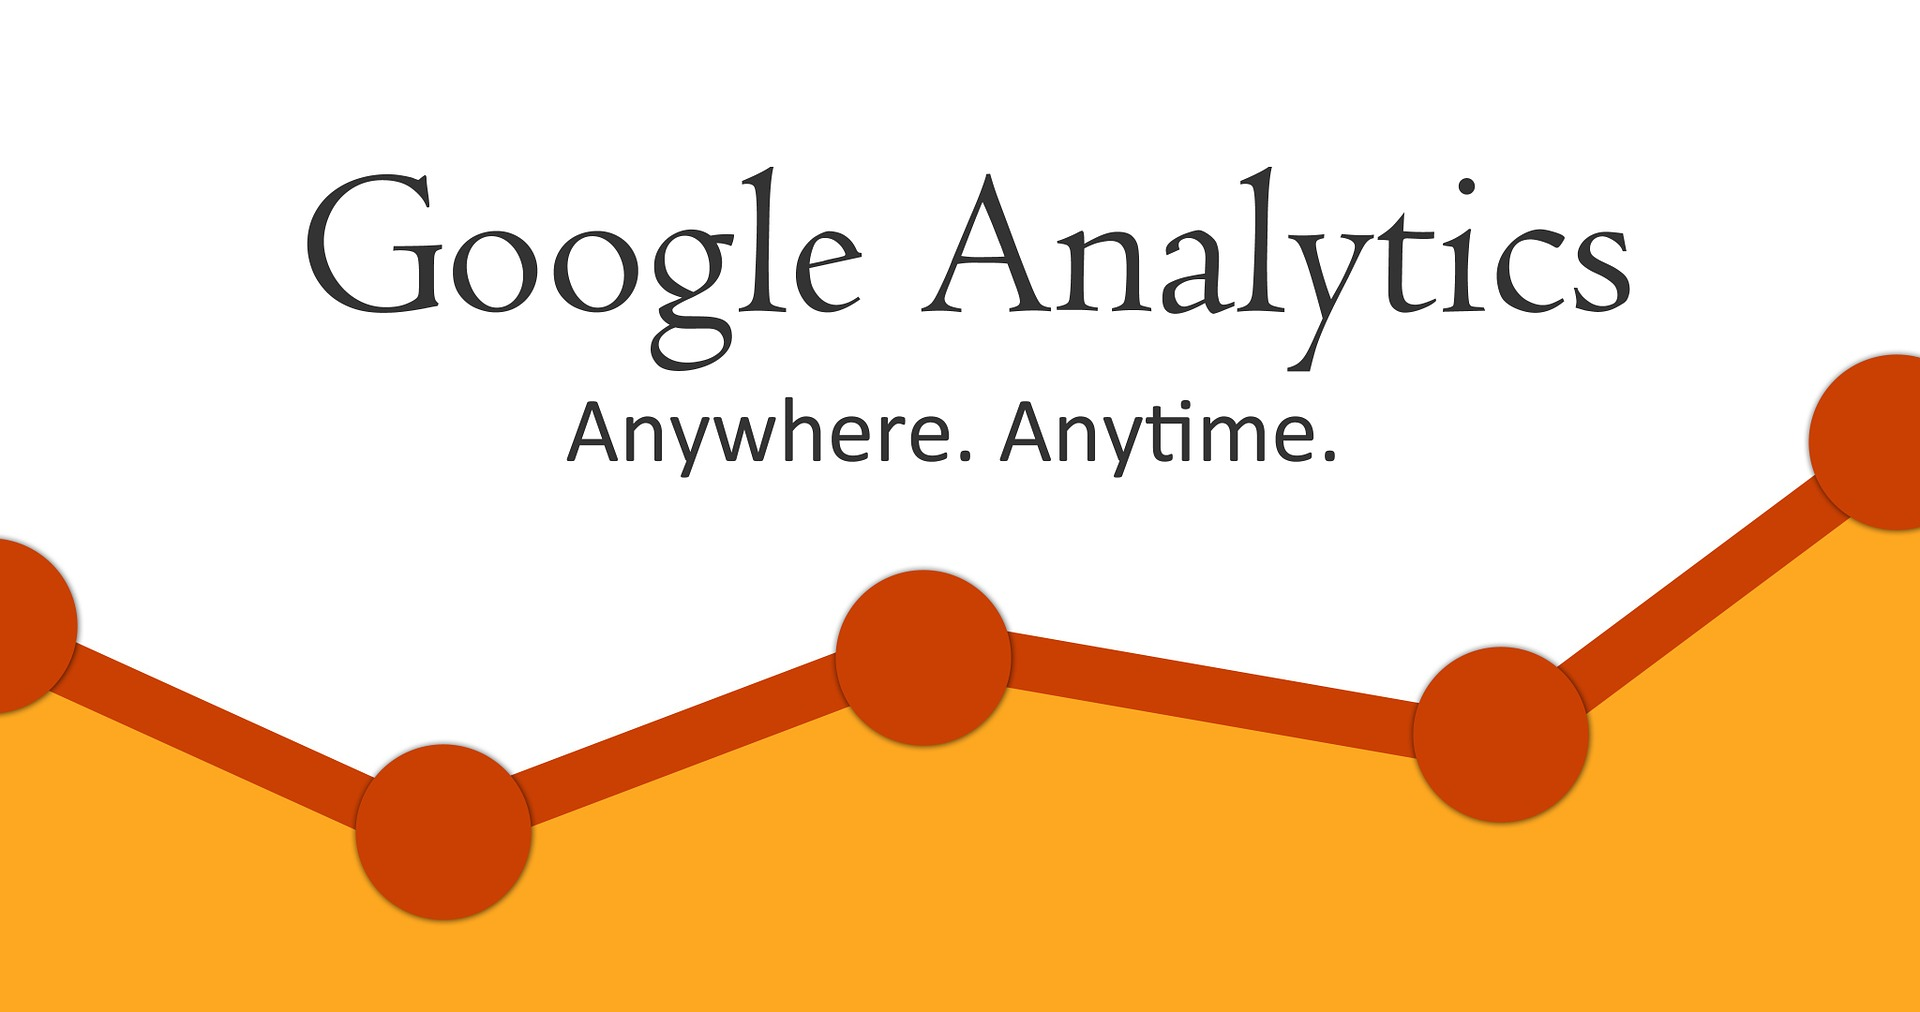 Googleアナリティクスって何ができるの?登録方法と使い方